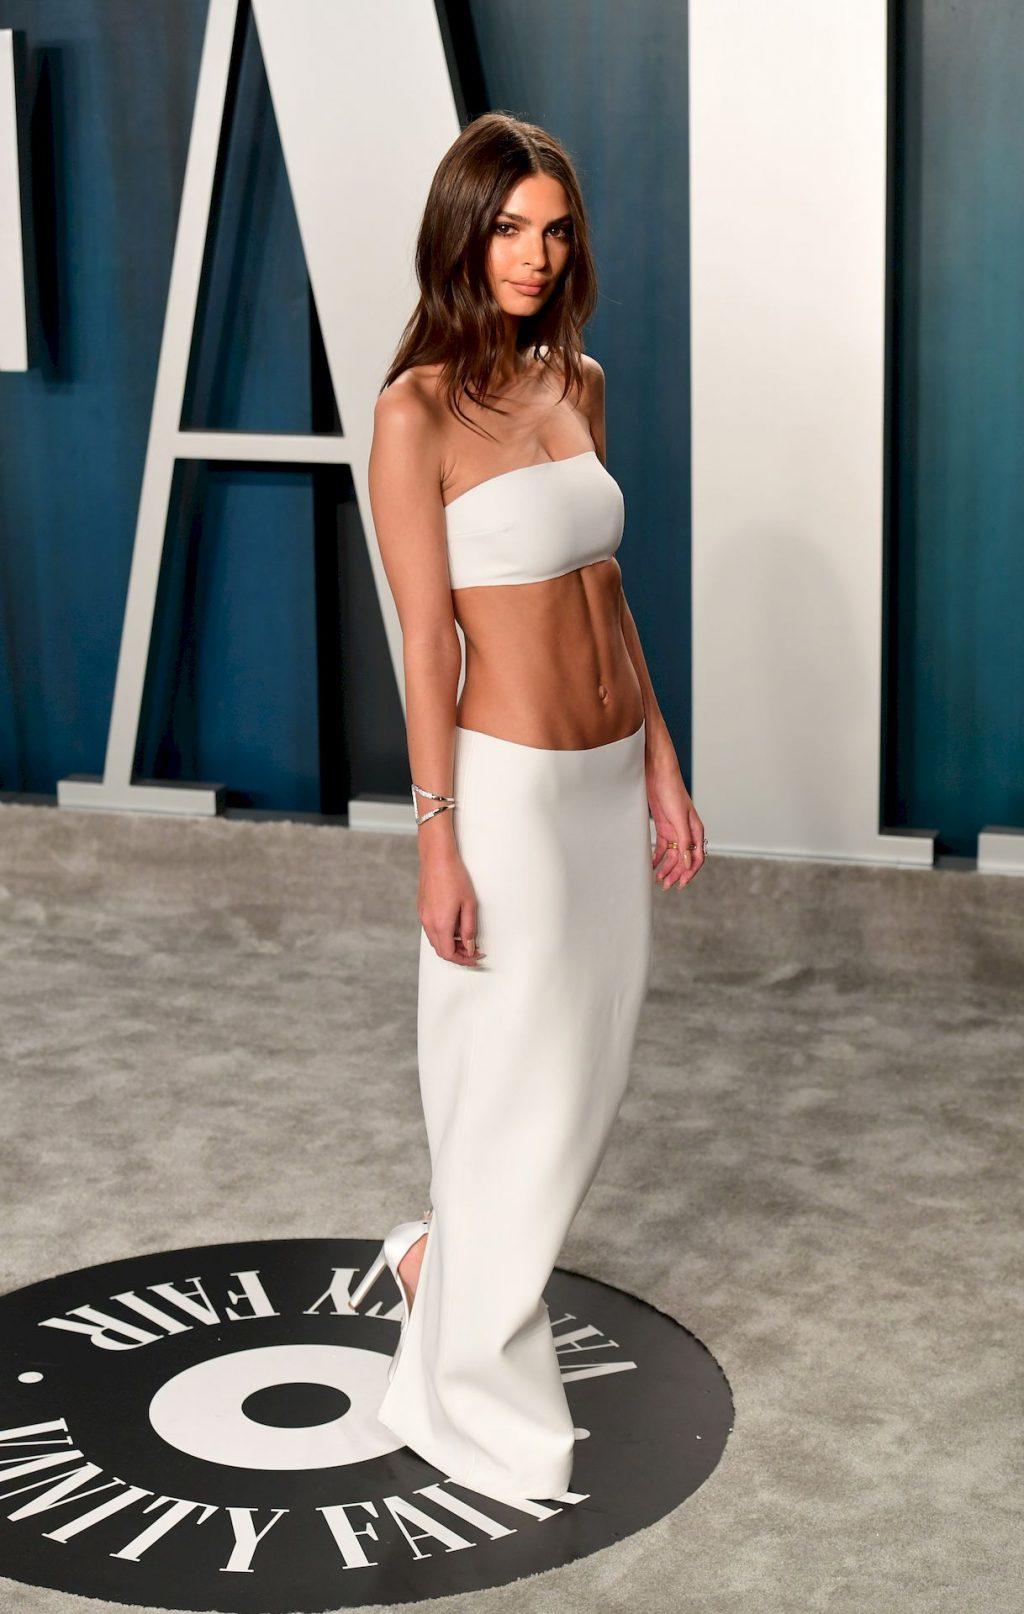 Emily Ratajkowski Looks Too Thin at the Vanity Fair Oscar Party (88 Photos + GIF & Video)